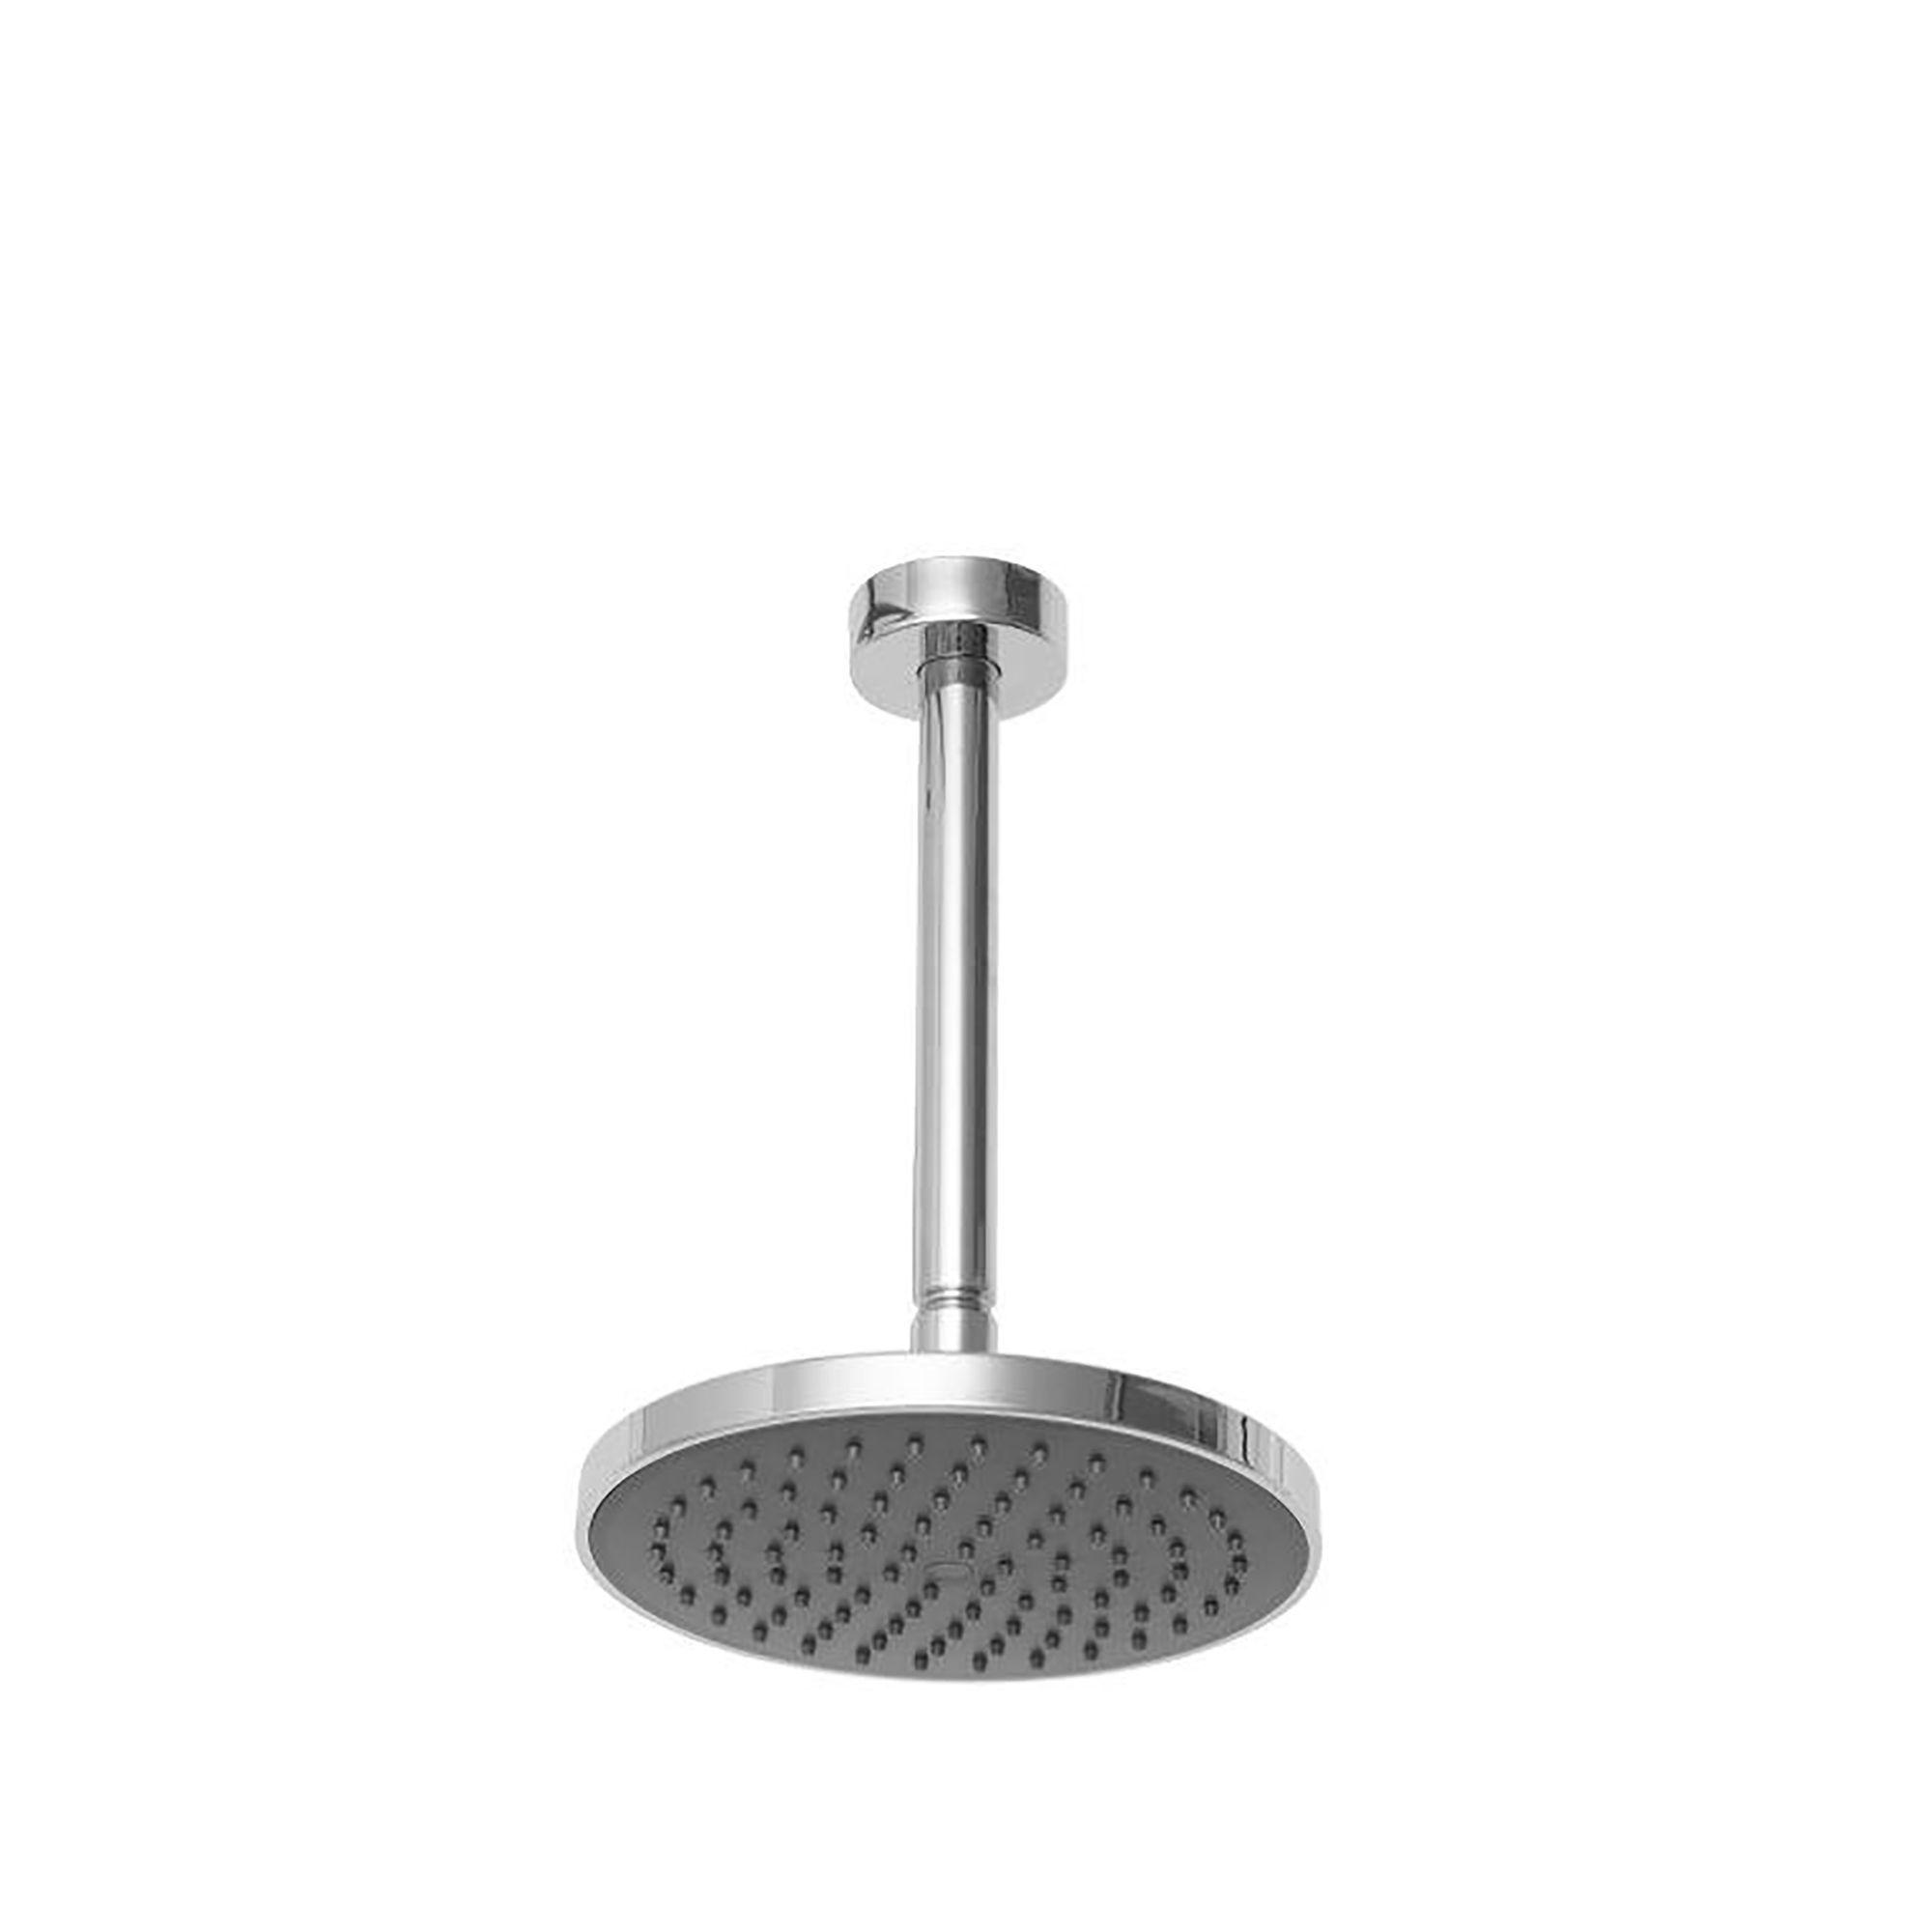 Triton Home Black Thermostatic Mixer Shower With Riser Rail, Diverter